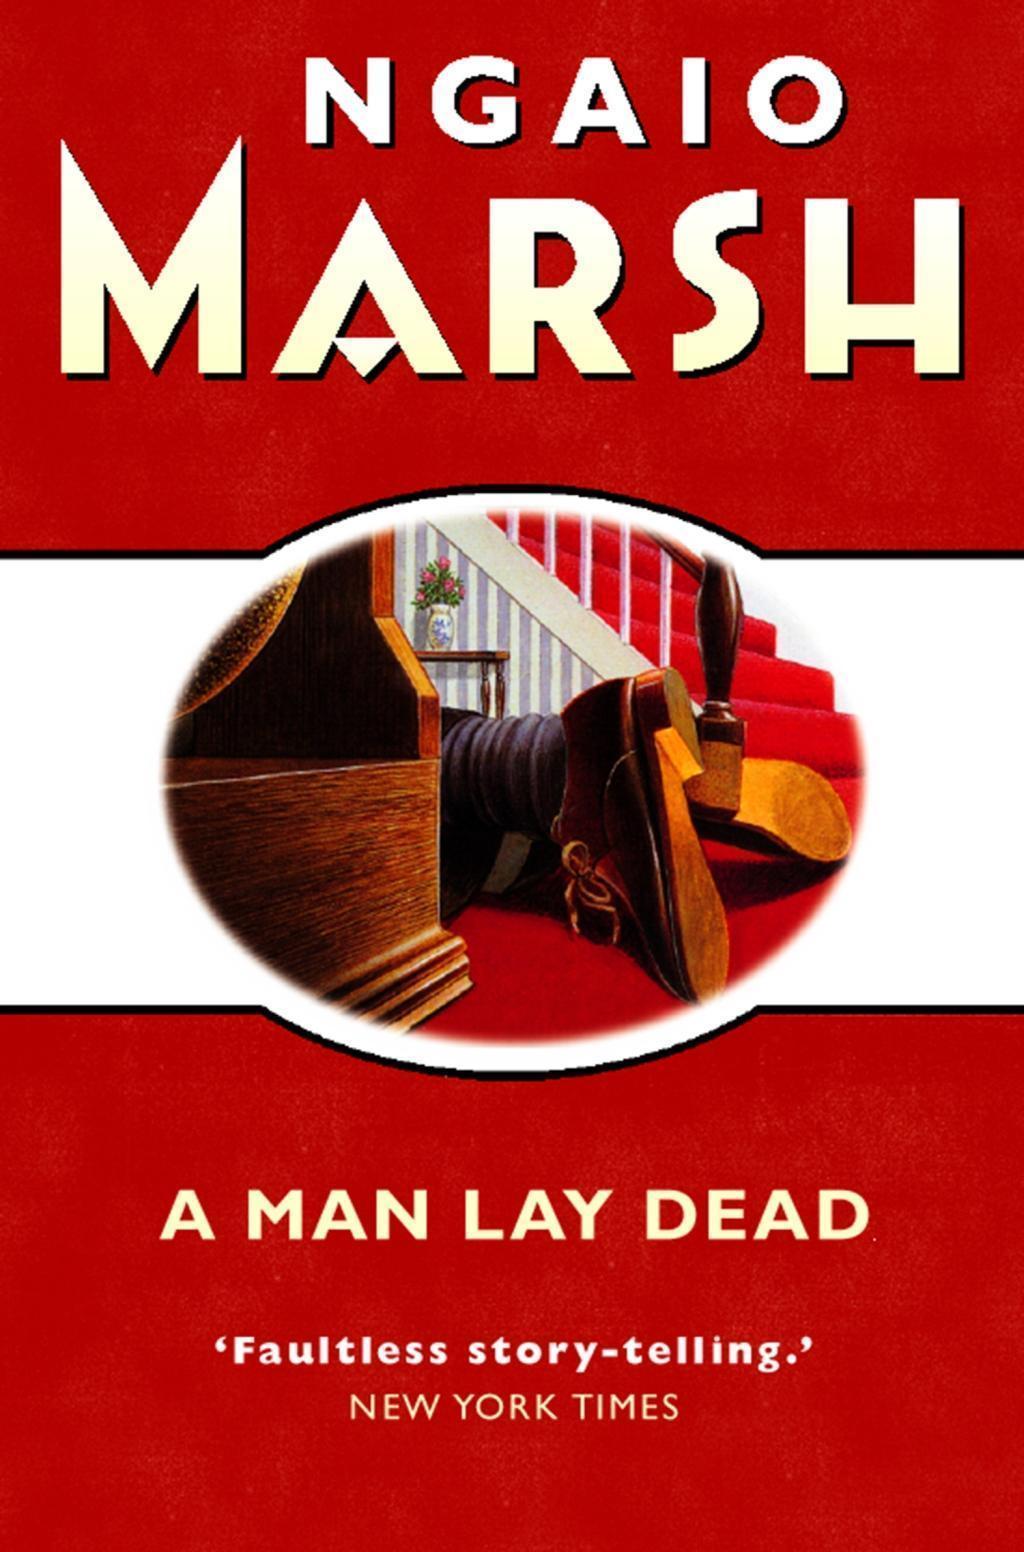 A Man Lay Dead (The Ngaio Marsh Collection)